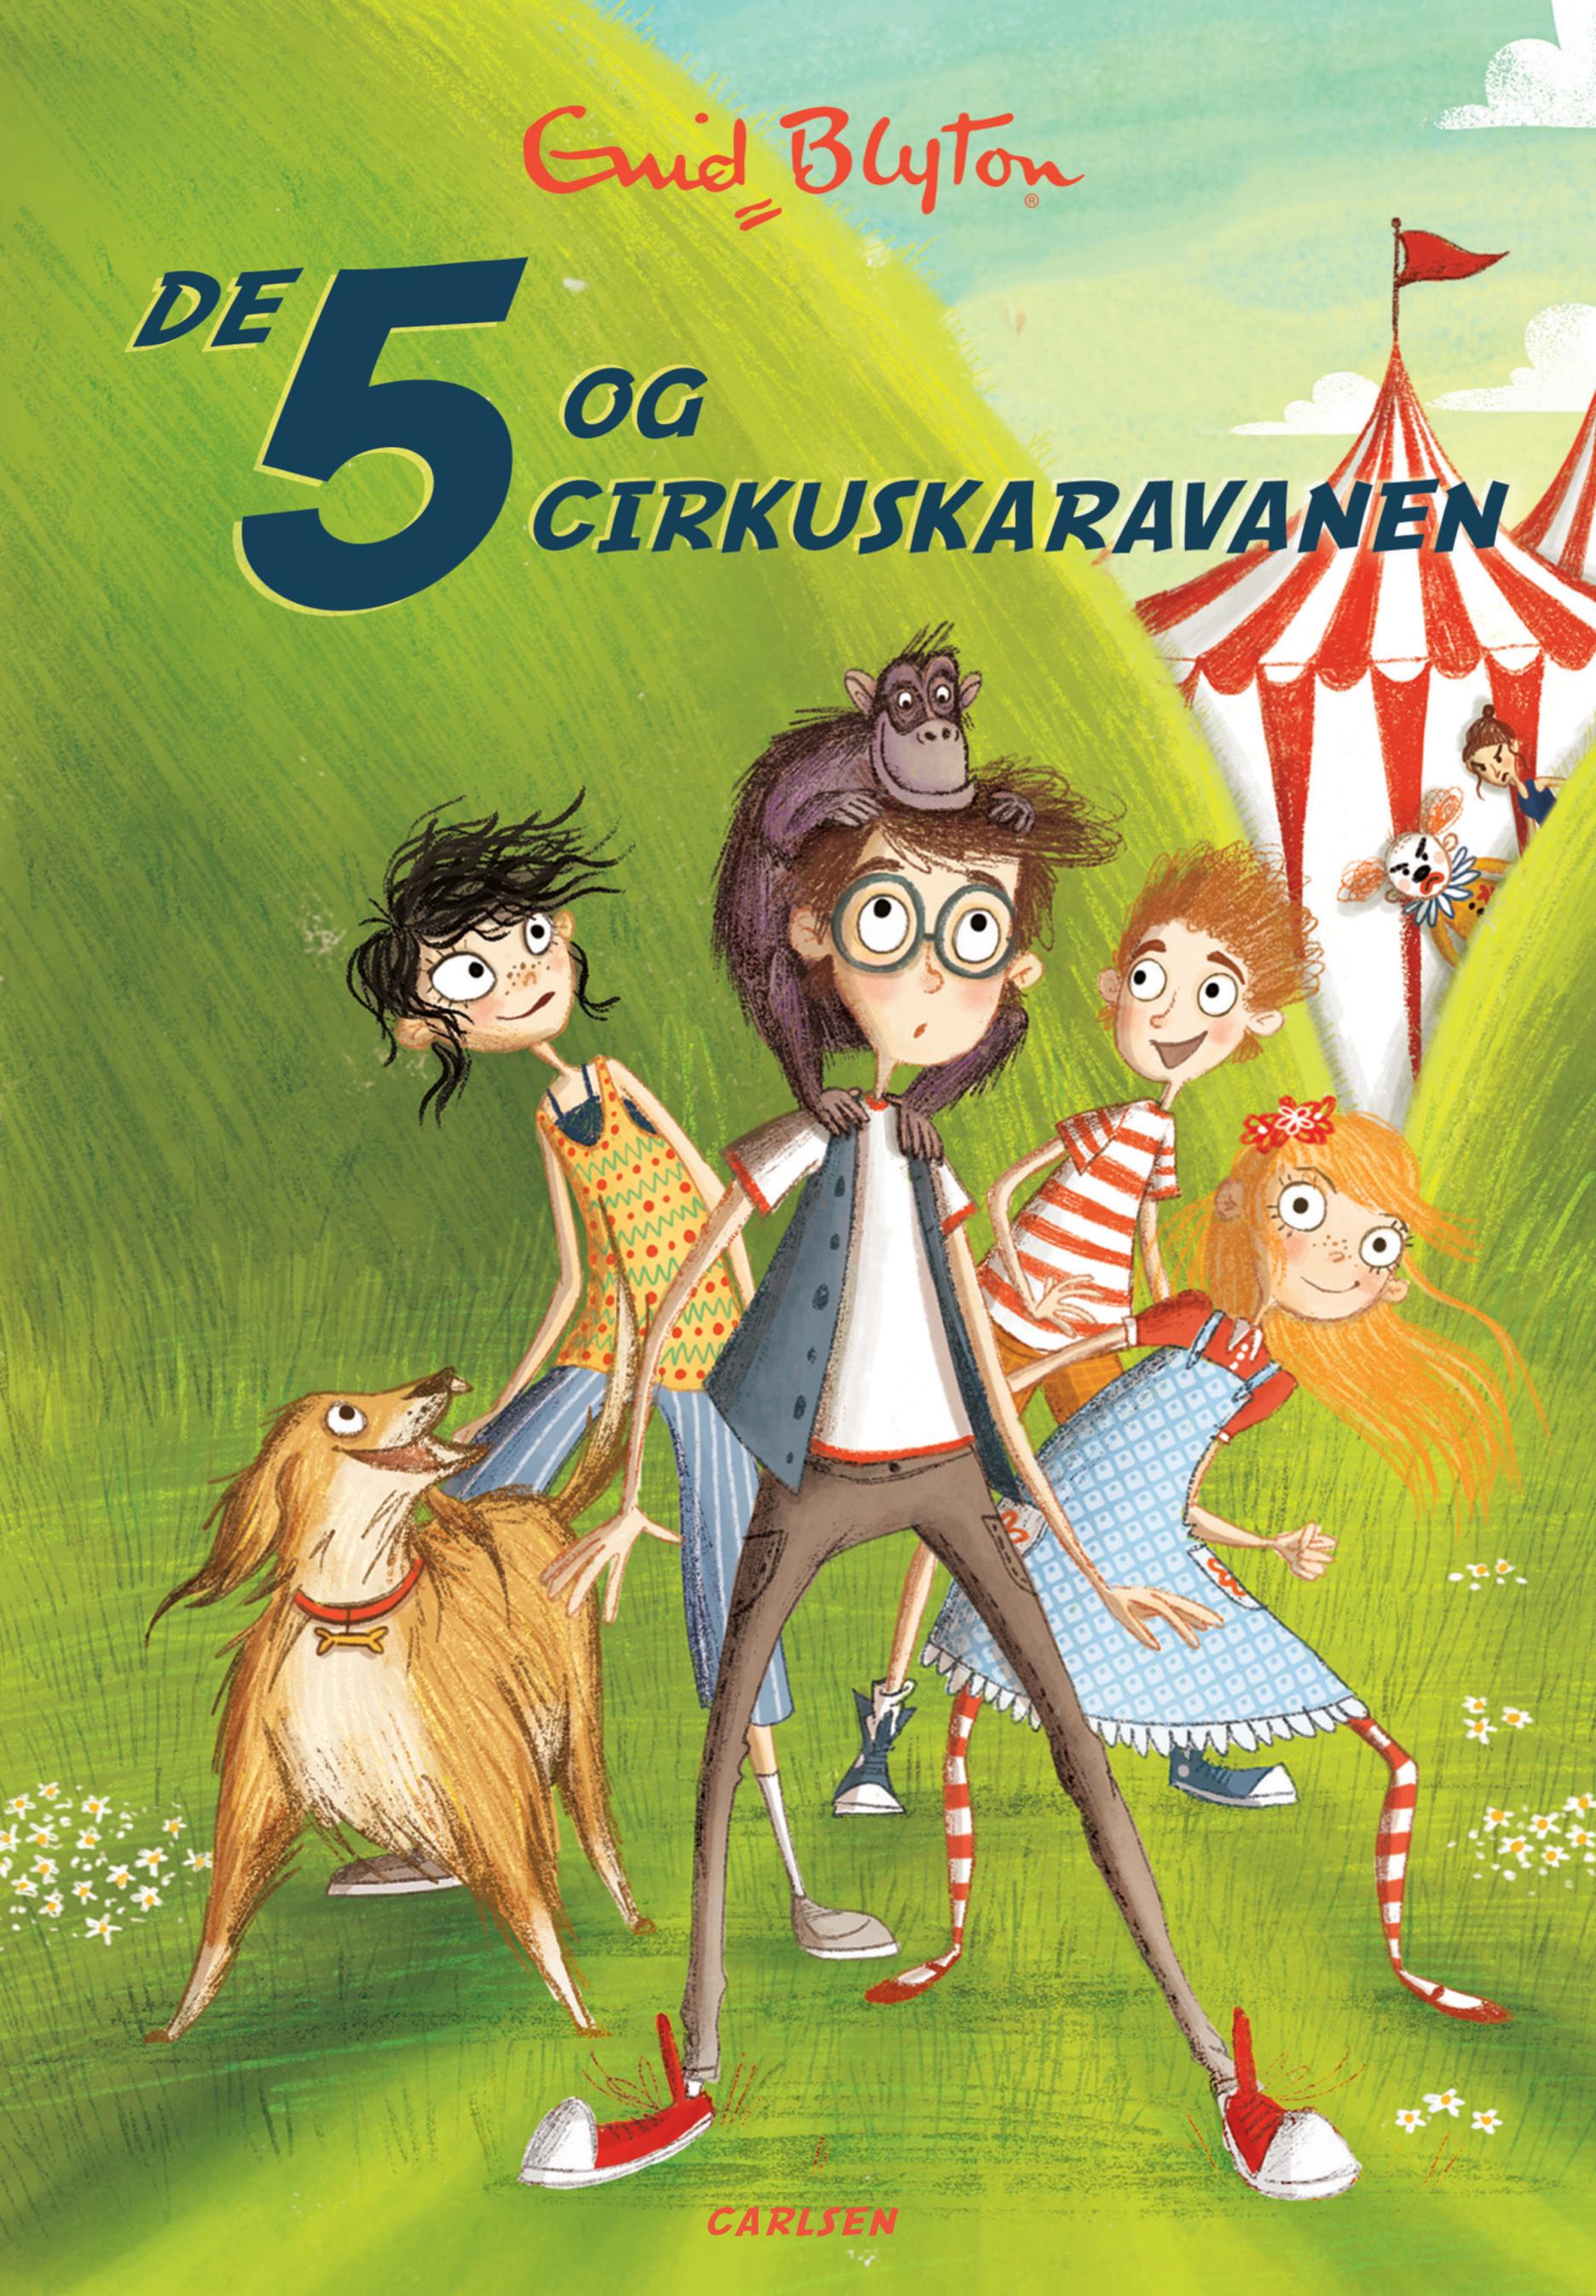 De 5 og cirkuskaravanen (5) - Maneno